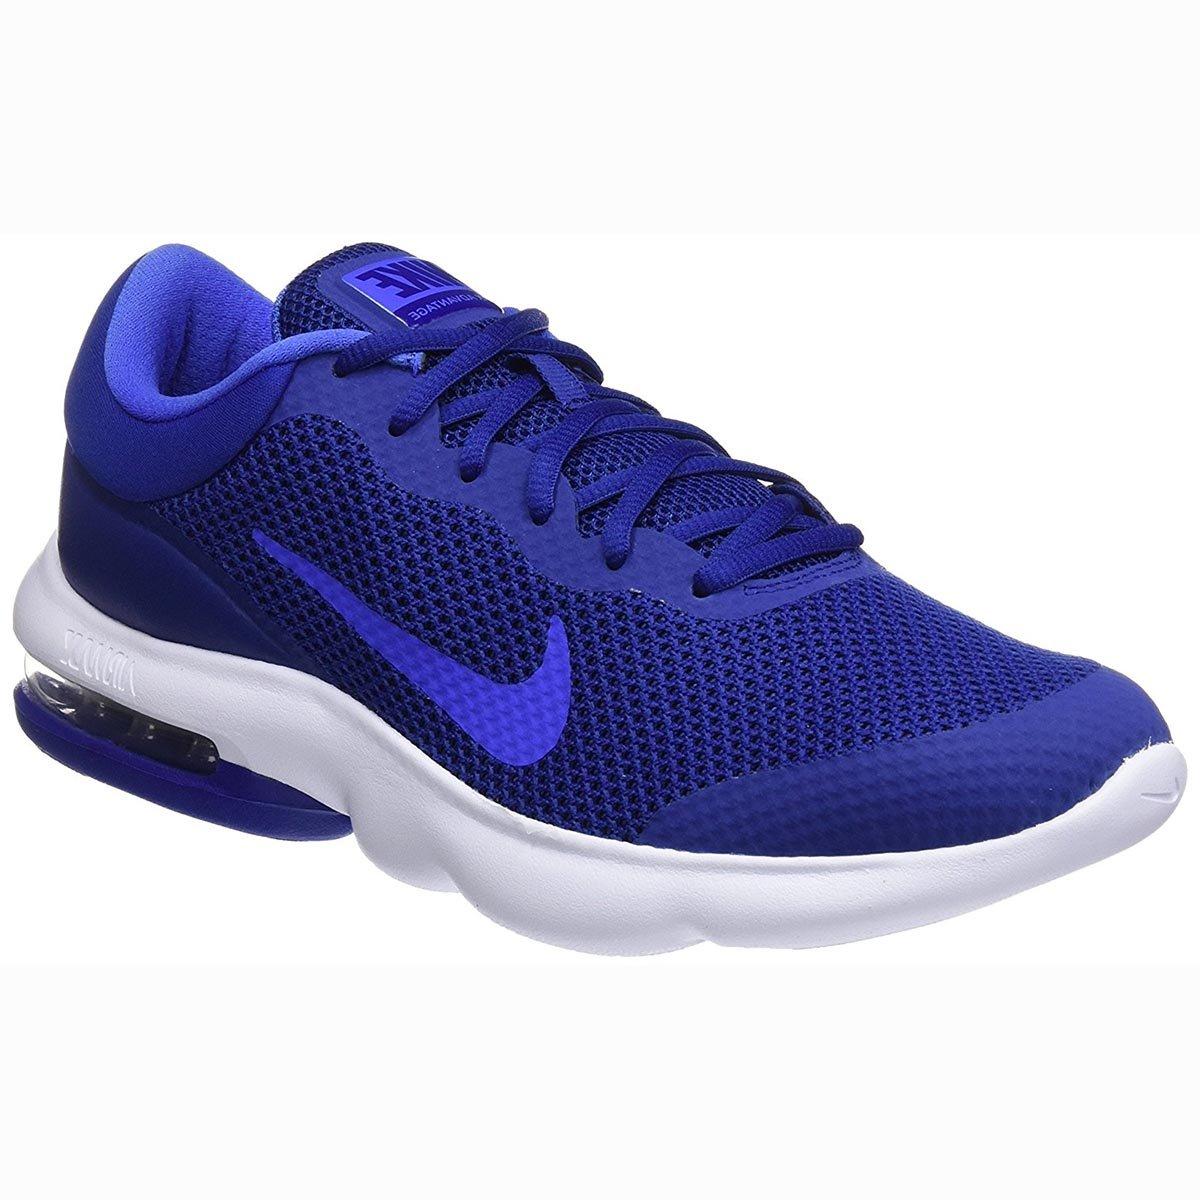 b964a70eec Buy Nike Air Max Advantage Running Shoes (Royal Blue) Online